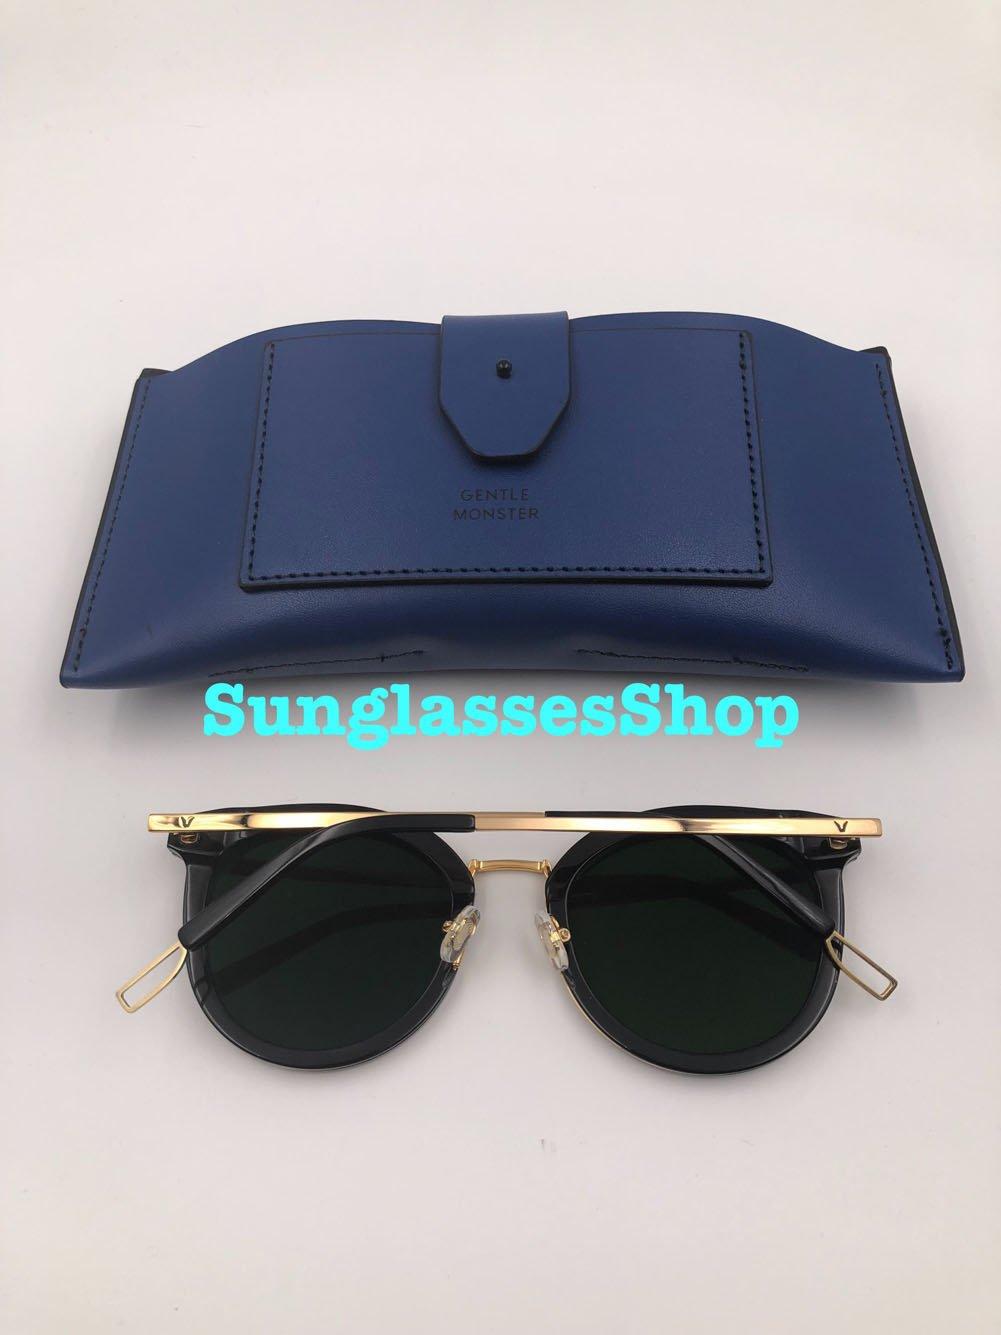 c3a4897ee39 Amazon.com   Gentle Monster Sunglasses Merlynn Black Frame Black Zeiss  Lenses With Original Package Sets   Everything Else